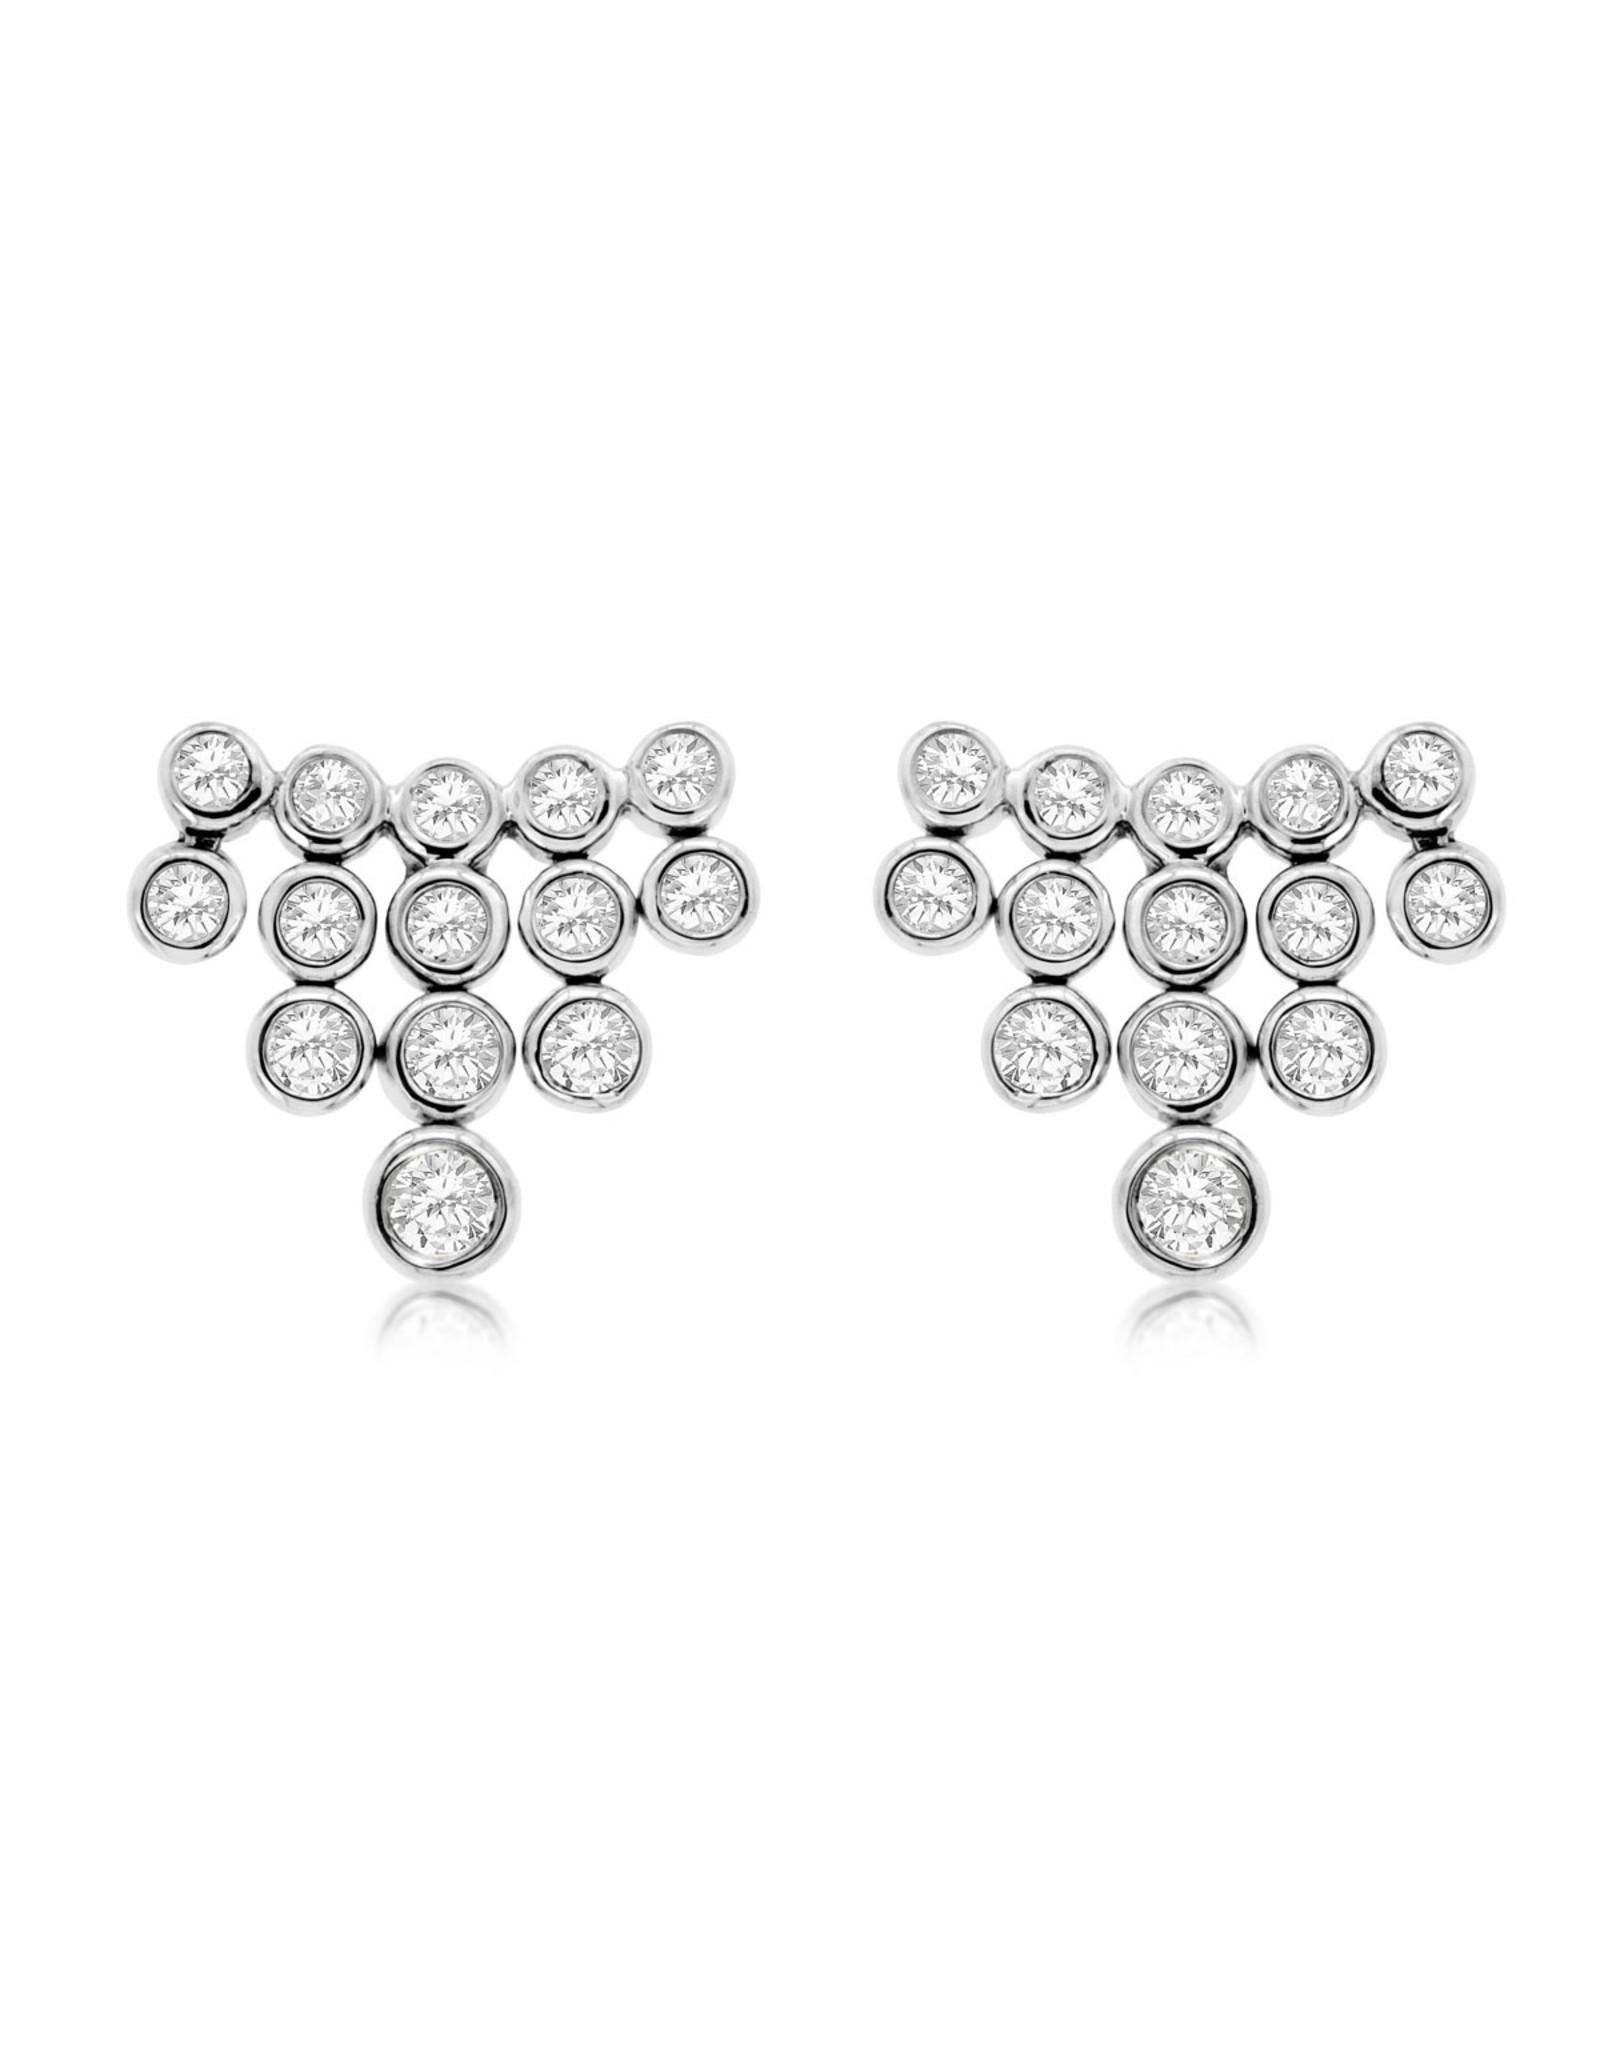 14K White Gold Cascade Diamond Fashion Stud Earrings, D: 0.40ct